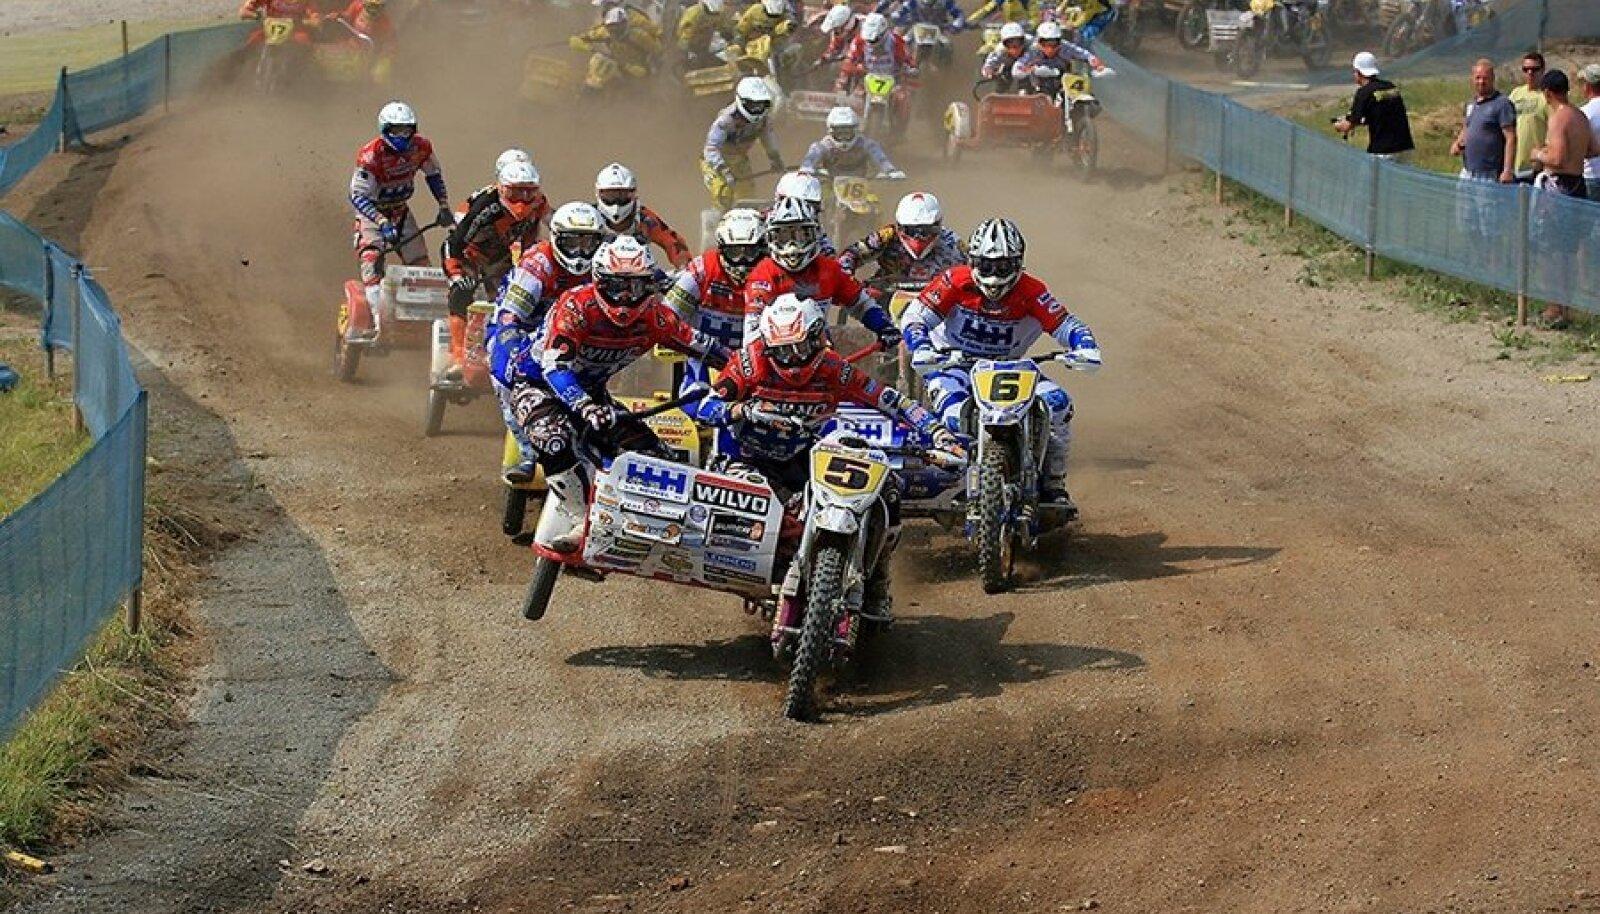 Kiviõli Motofestival 2012